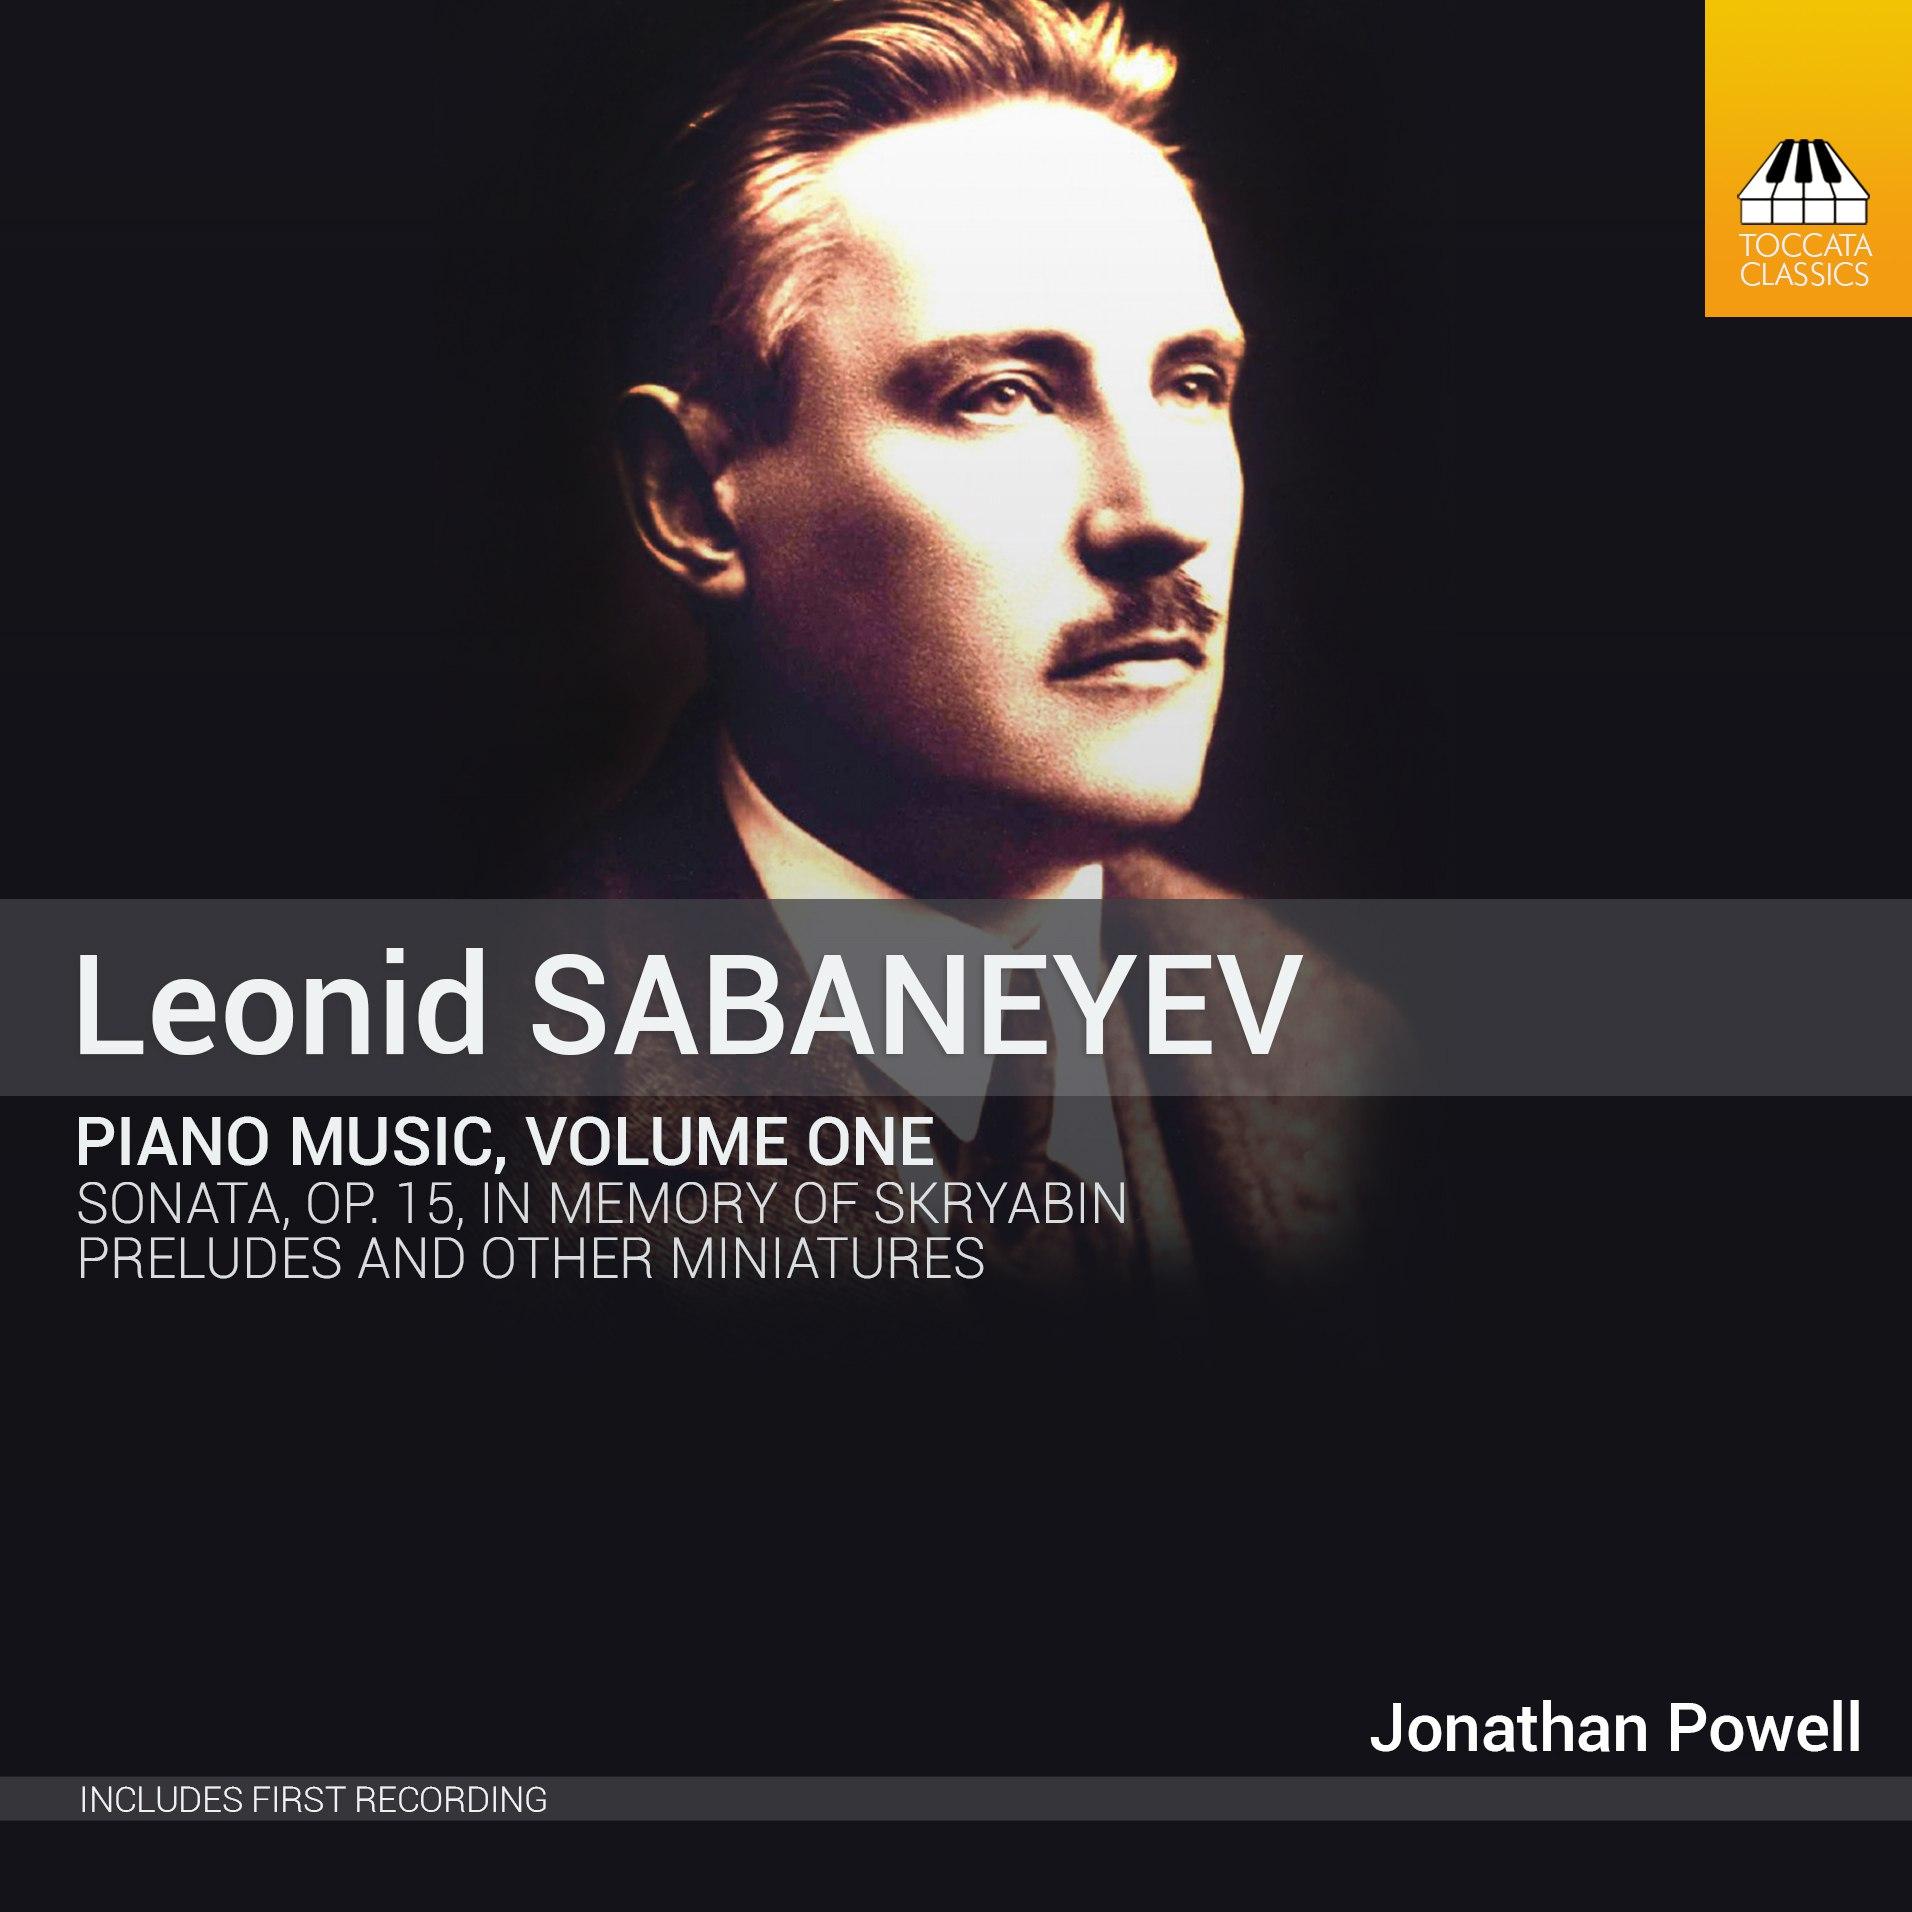 Leonid Sabaneyev: Piano Music